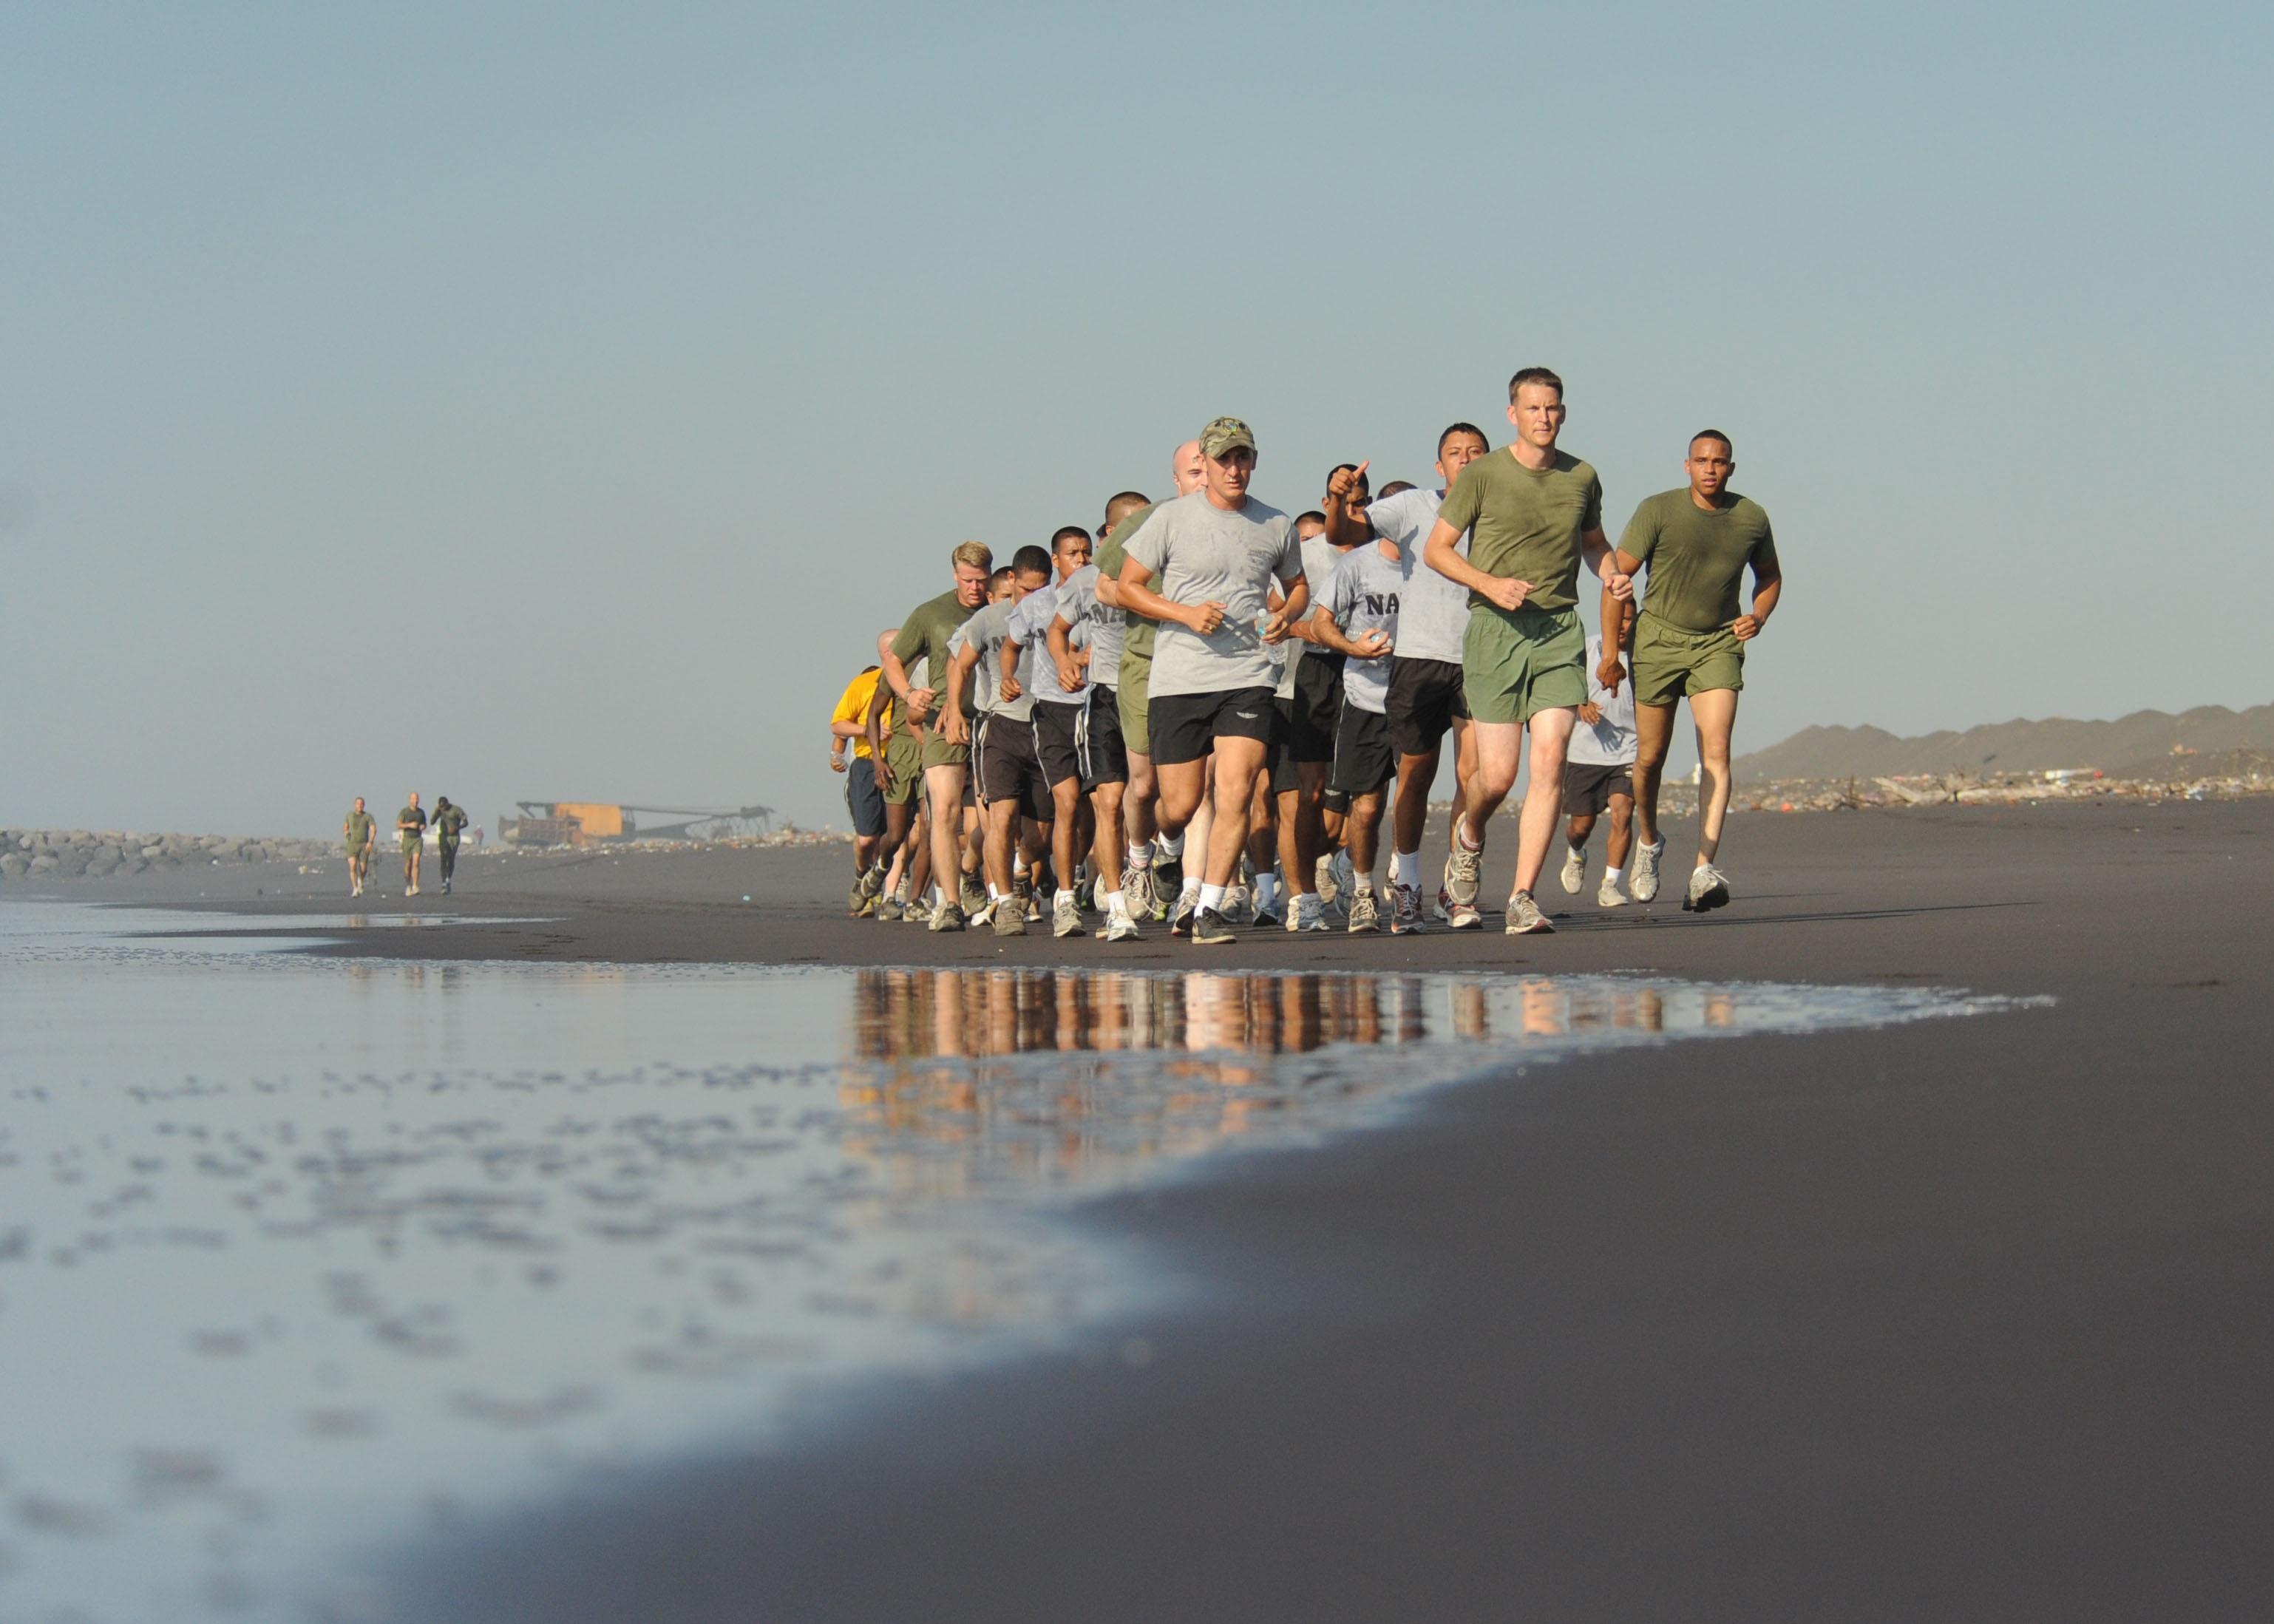 Running on the beach photo